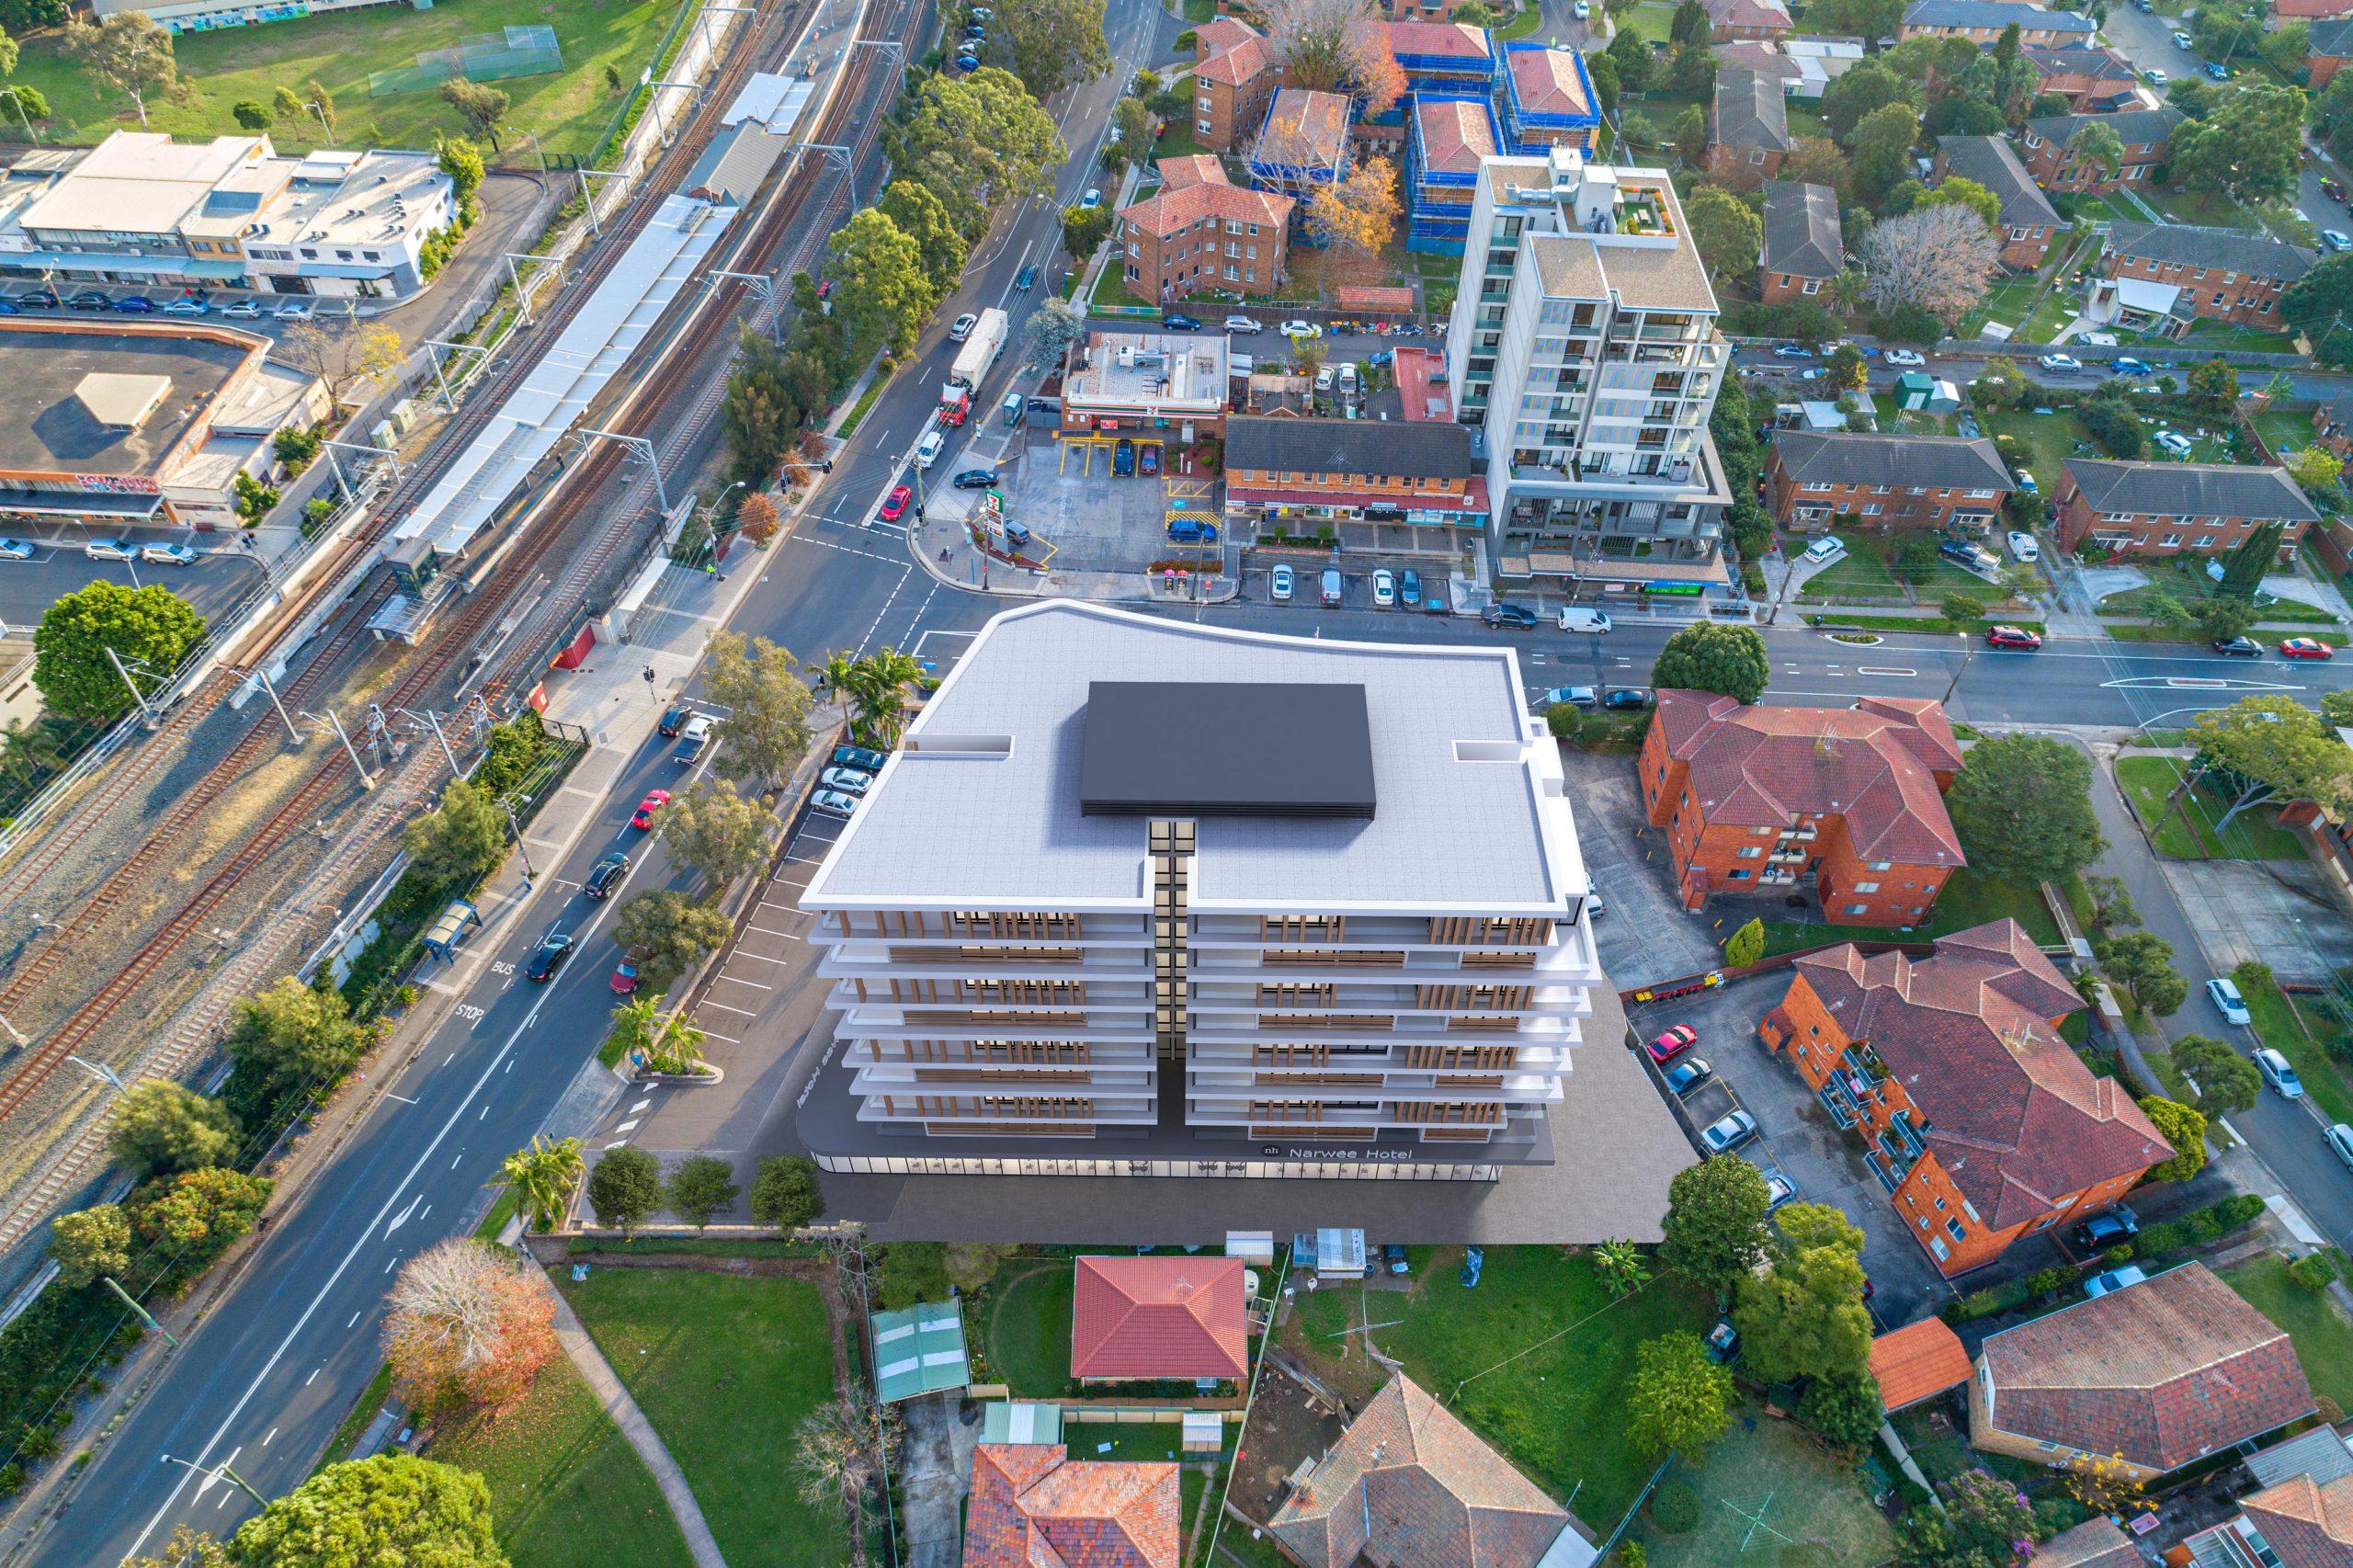 aerial perspective artist impression photomontage